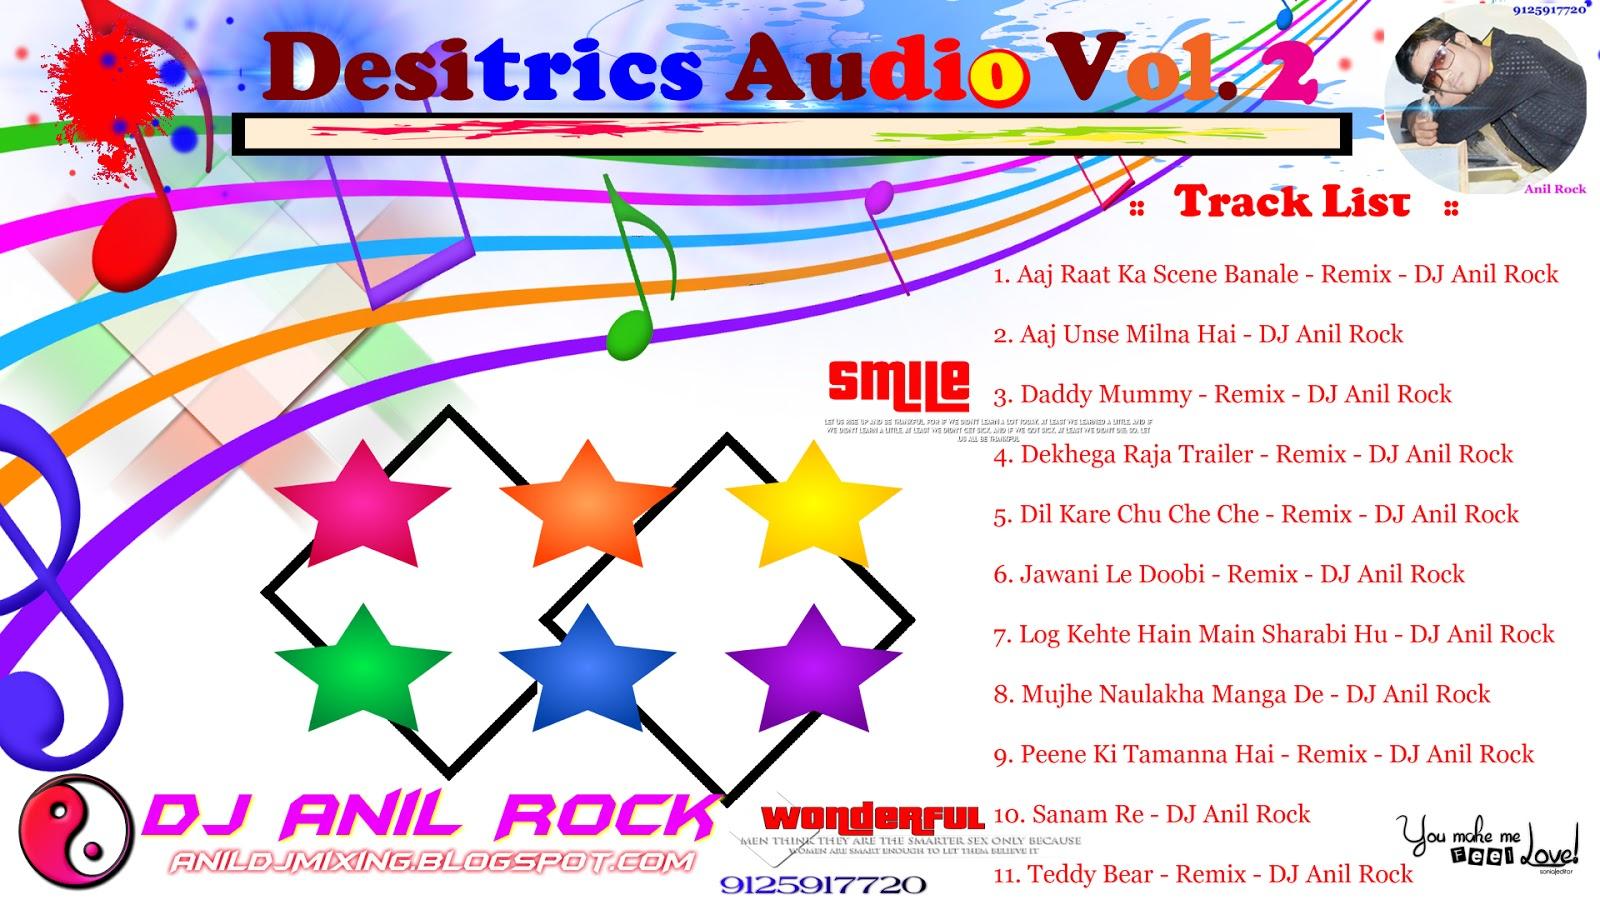 Desitrics Audio Vol 2 DJ Anil Rock ~ Dj Anil Rock -- 9125917720